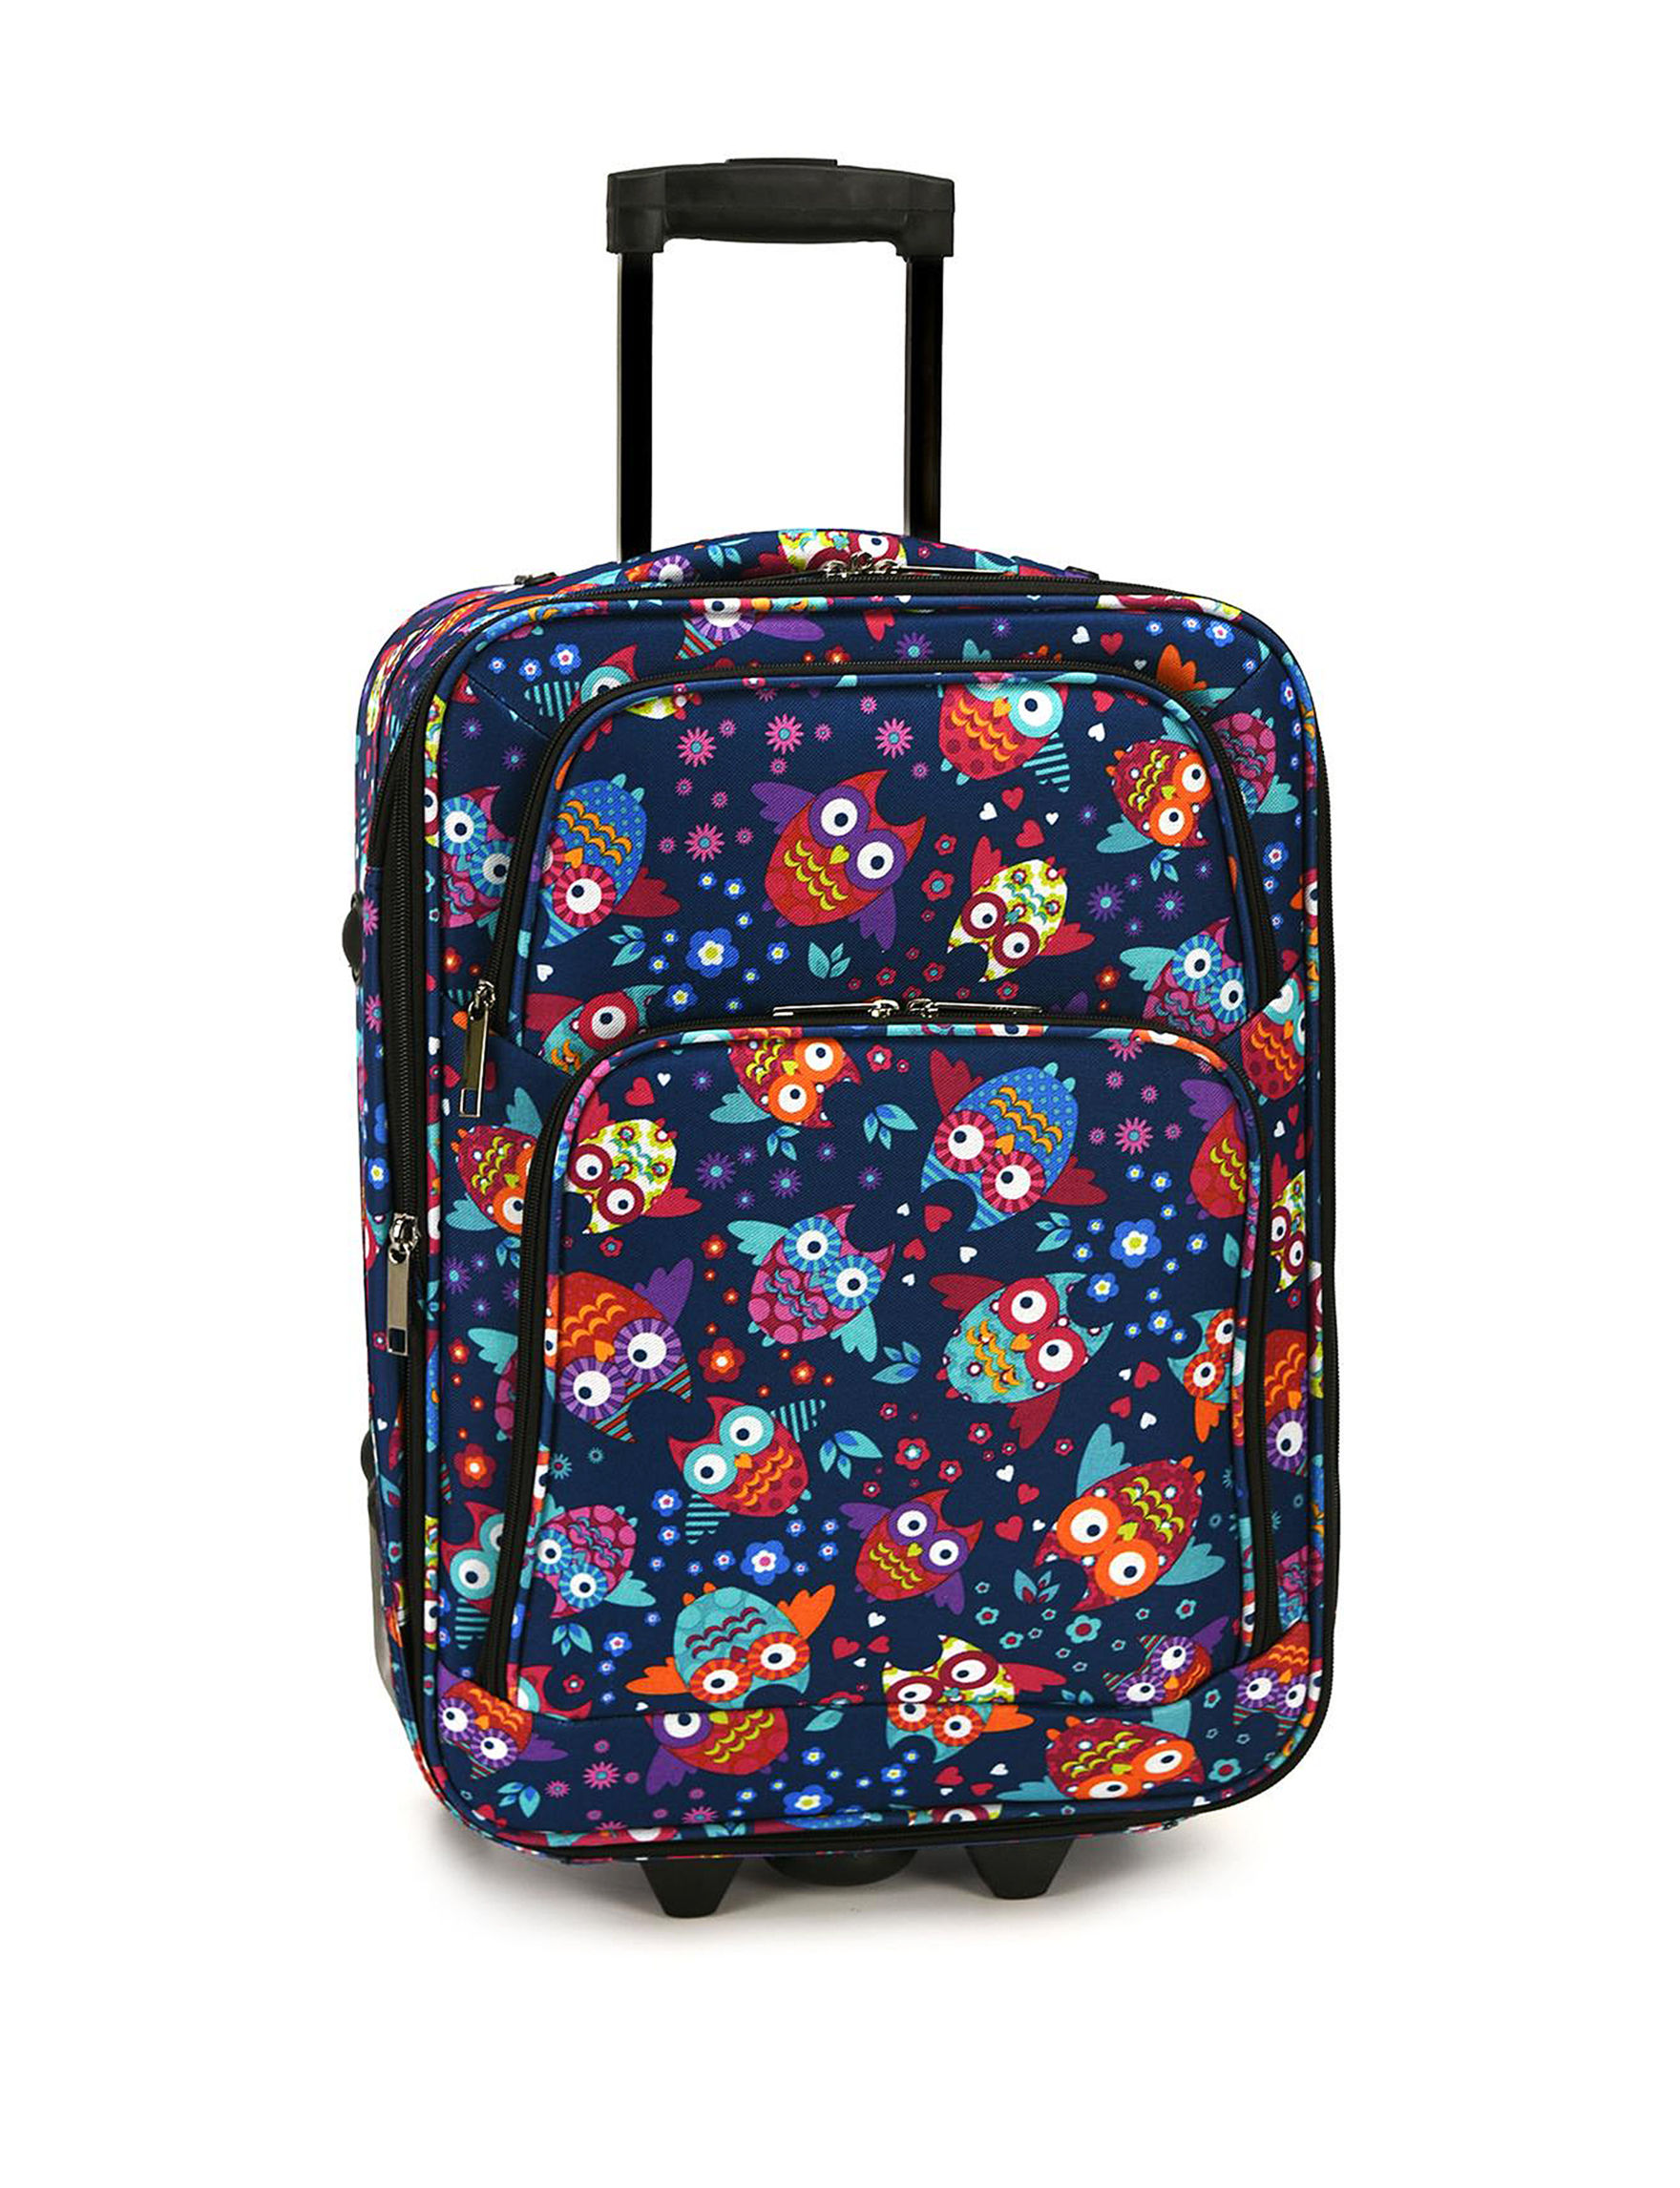 Elite Luggage Blue Multi Carry On Luggage